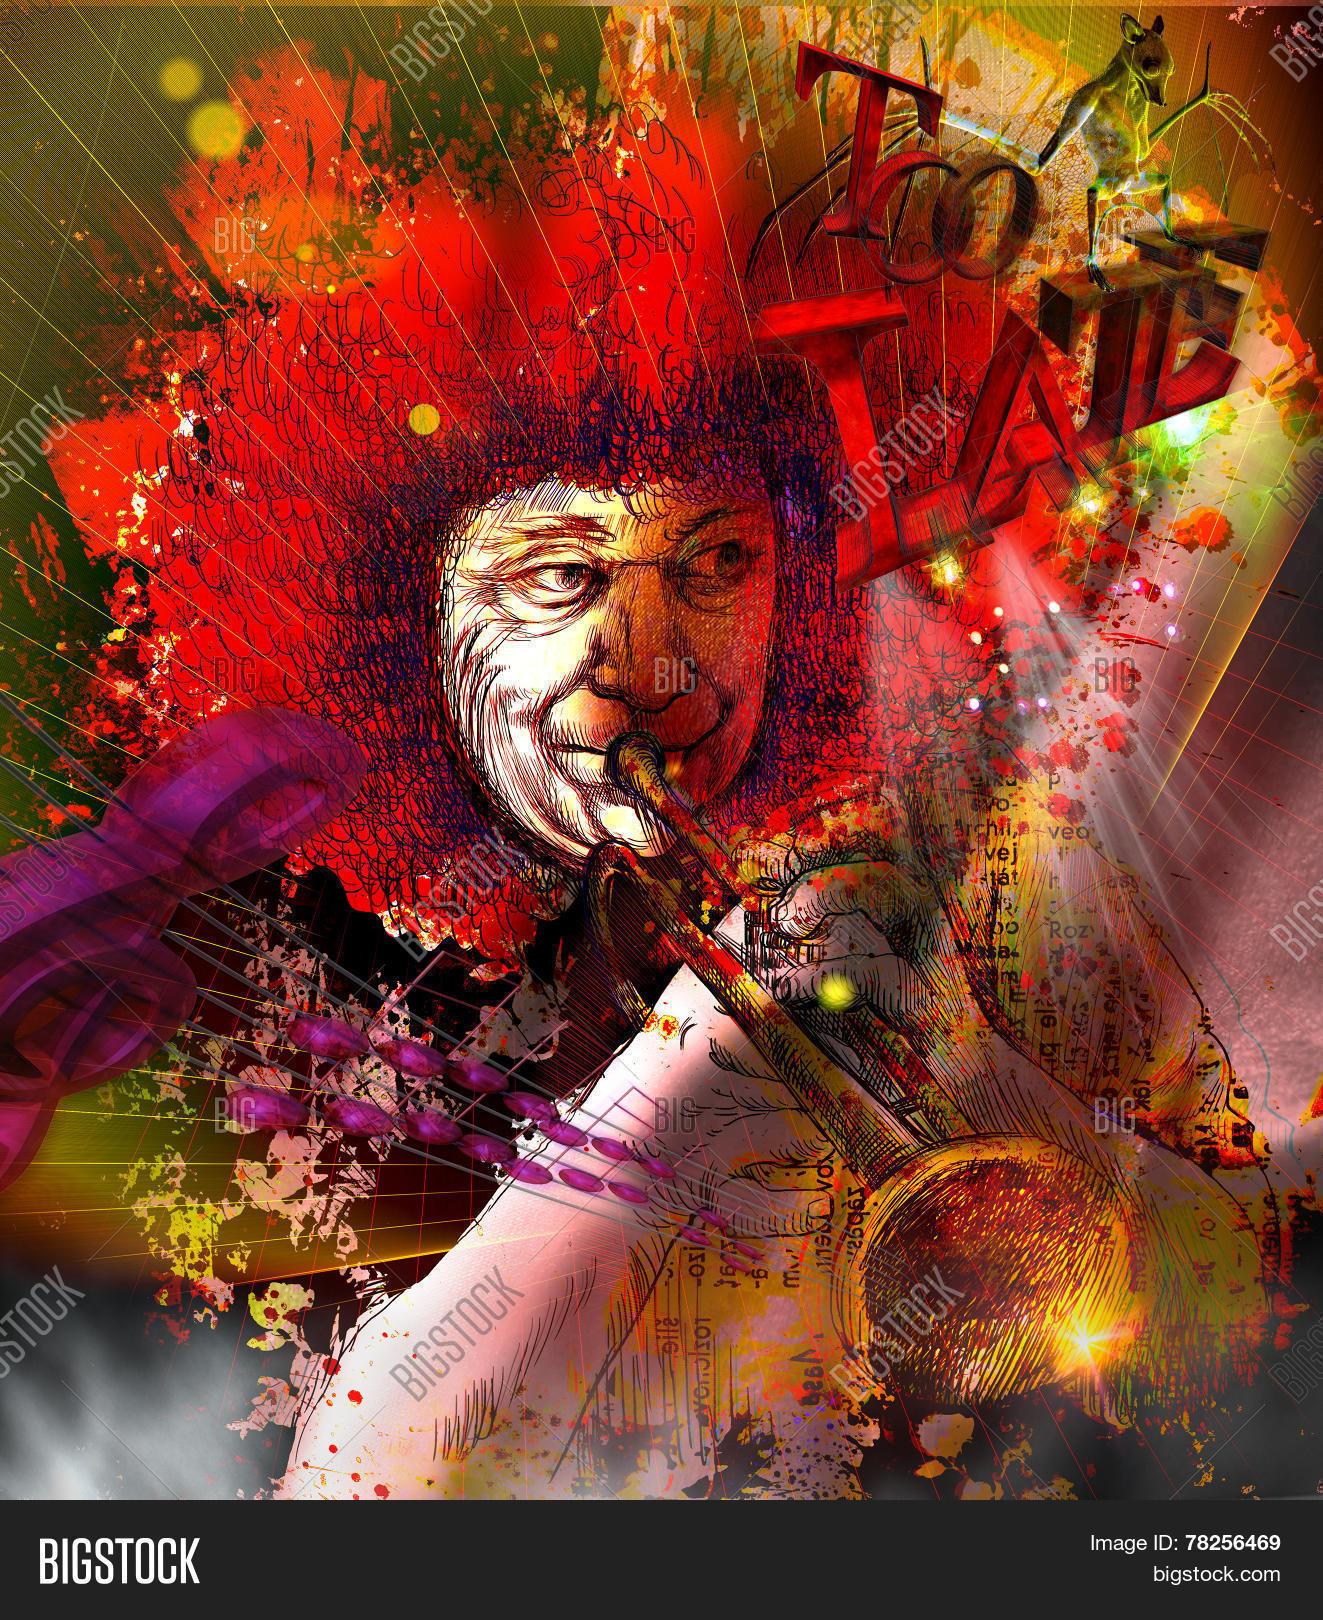 Musician: Trumpet Image & Photo (Free Trial) | Bigstock